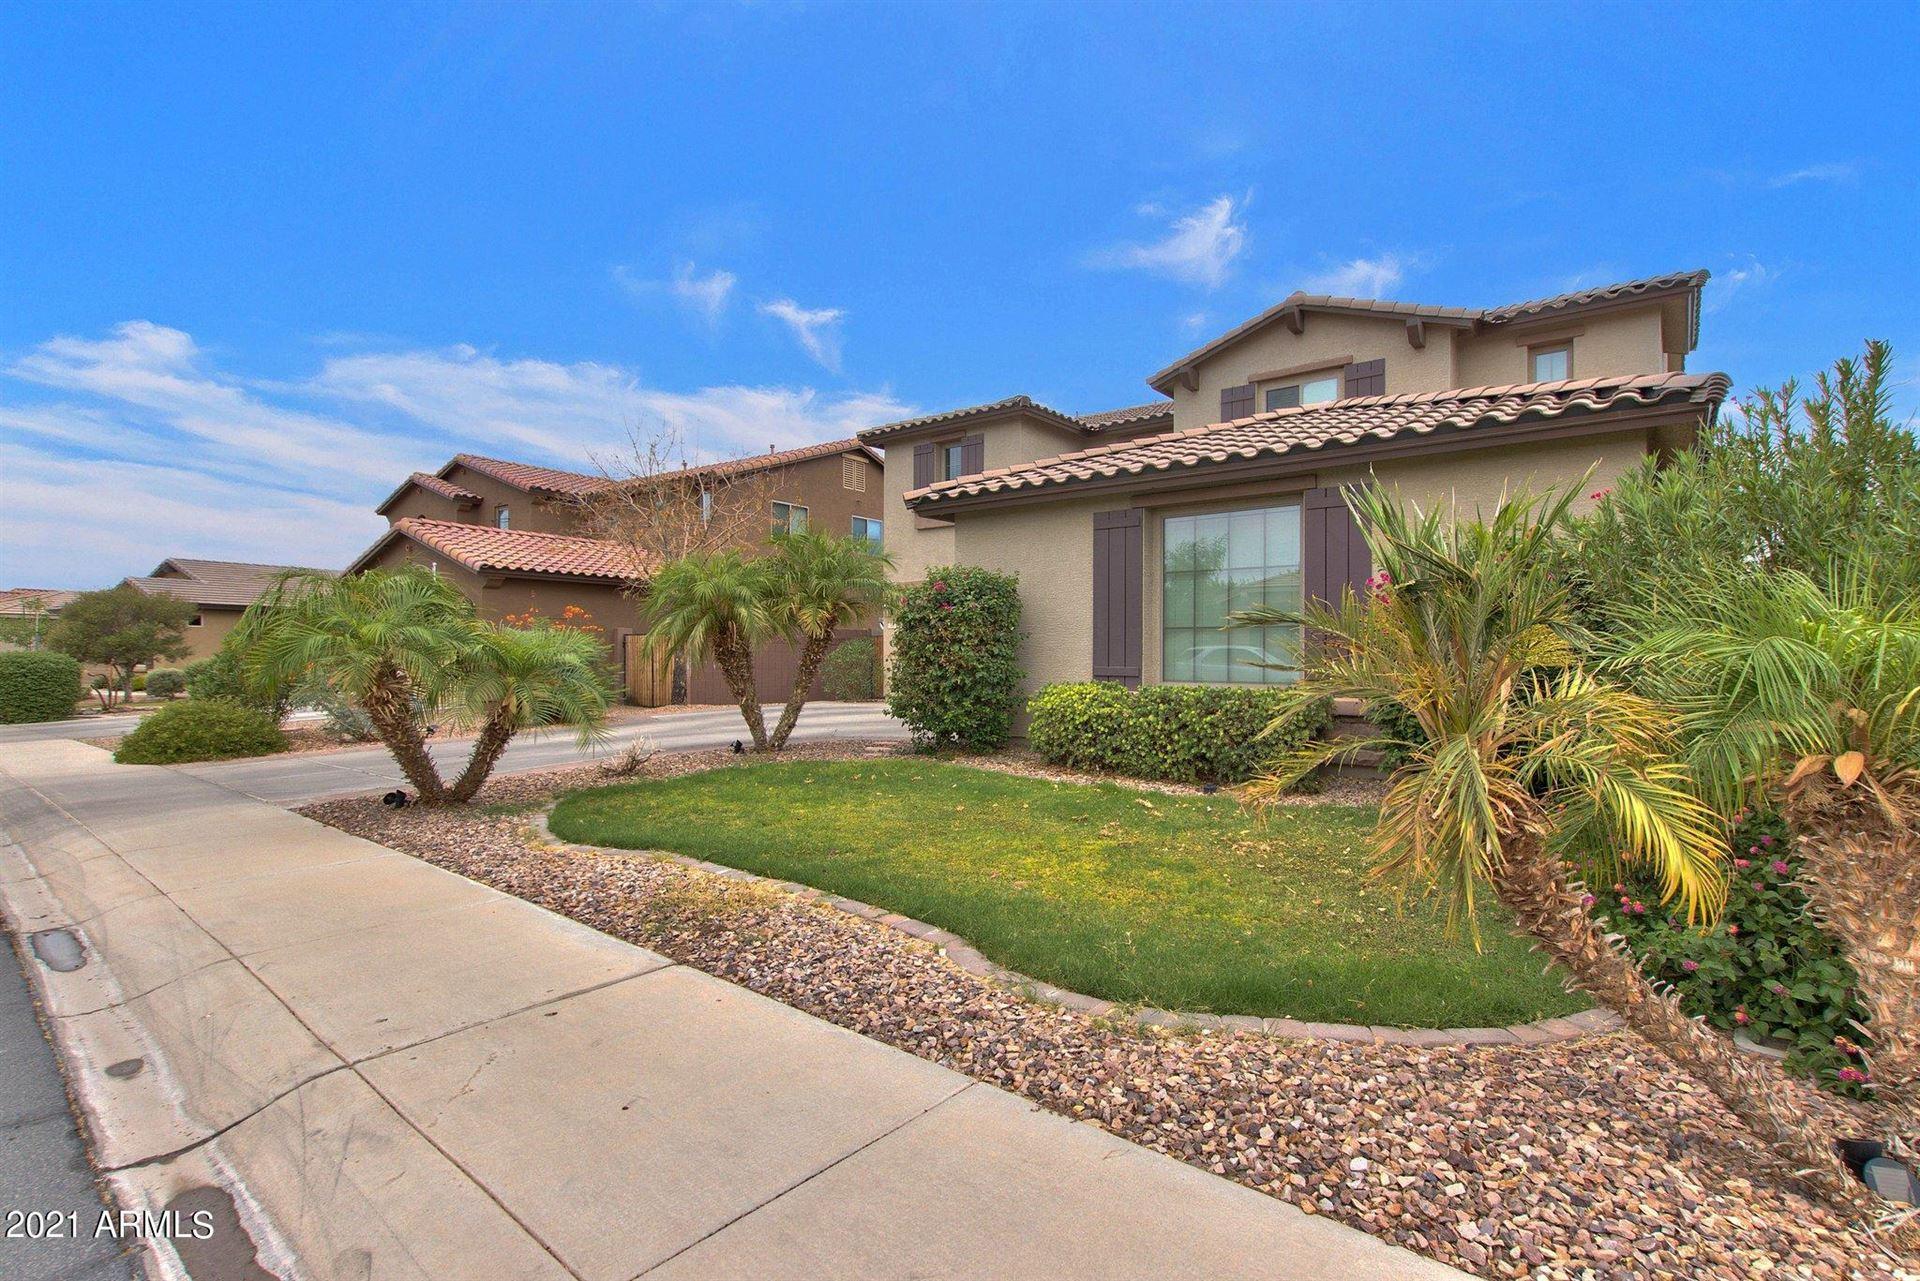 Photo of 708 W DRAGON TREE Avenue, Queen Creek, AZ 85140 (MLS # 6266142)